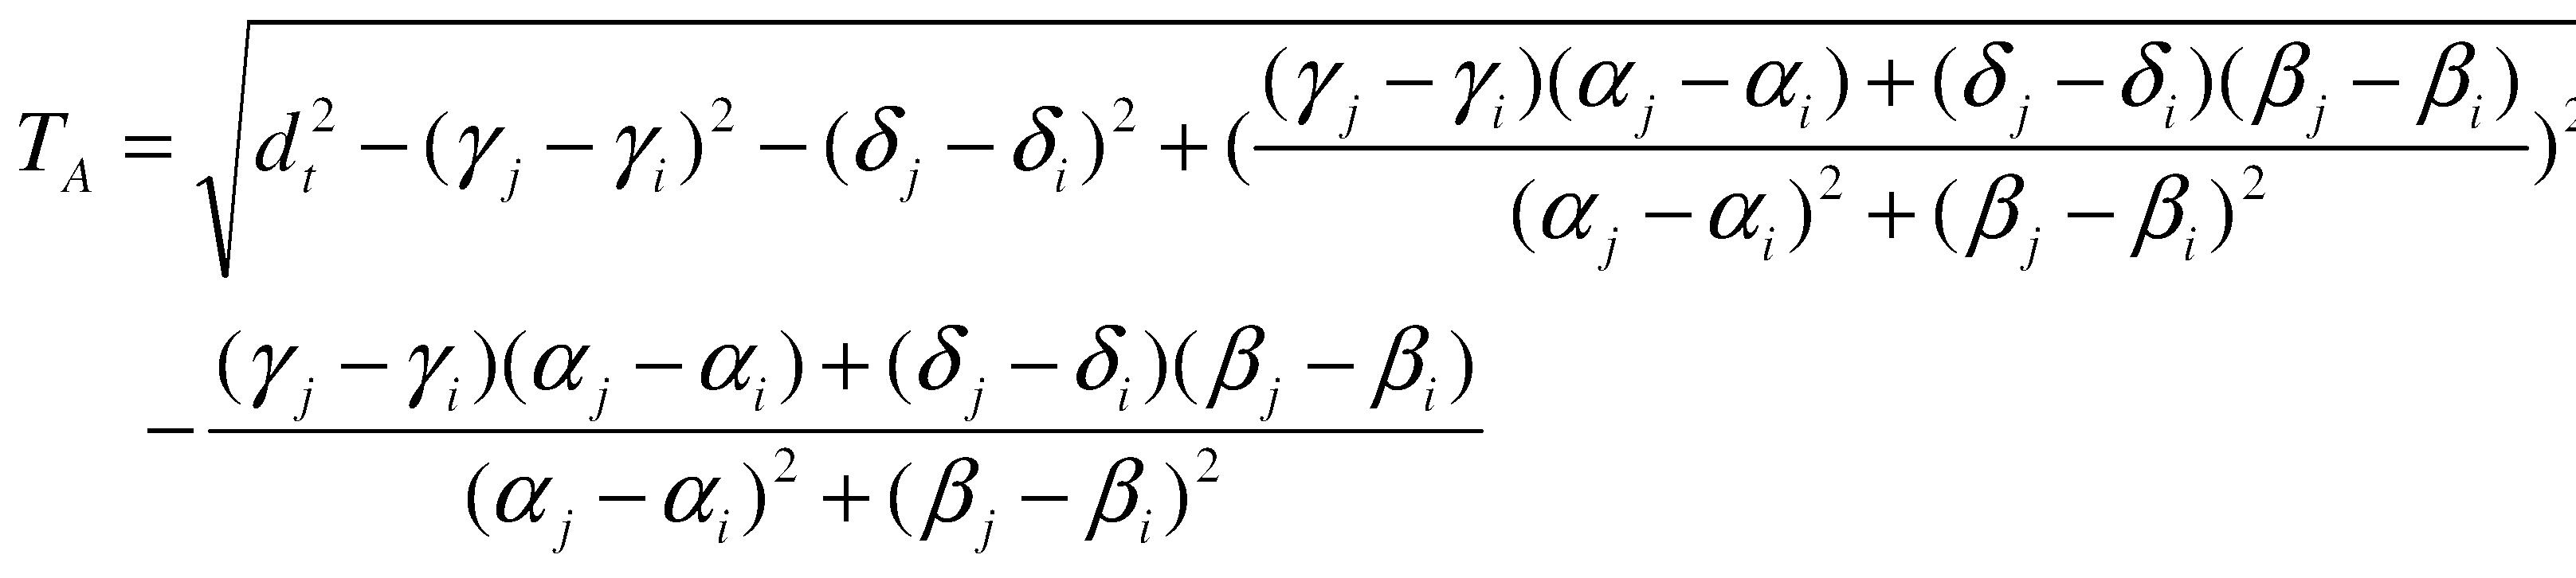 Figure 112011024379135-pat00041